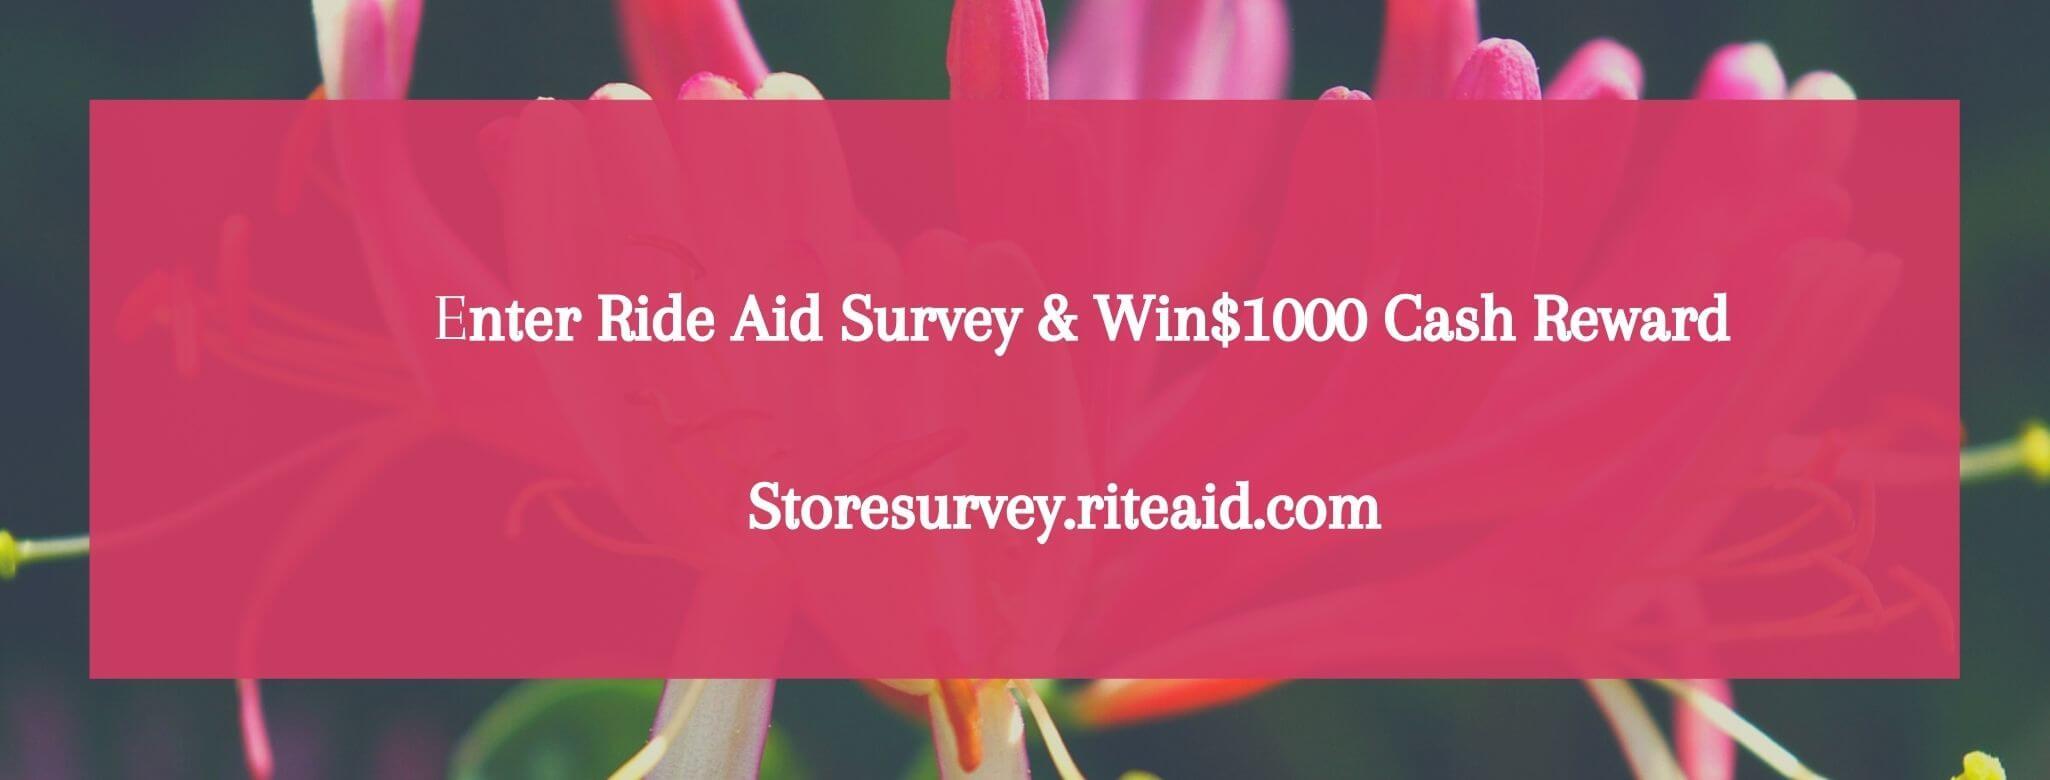 storesurvey.riteaid.com win $1000